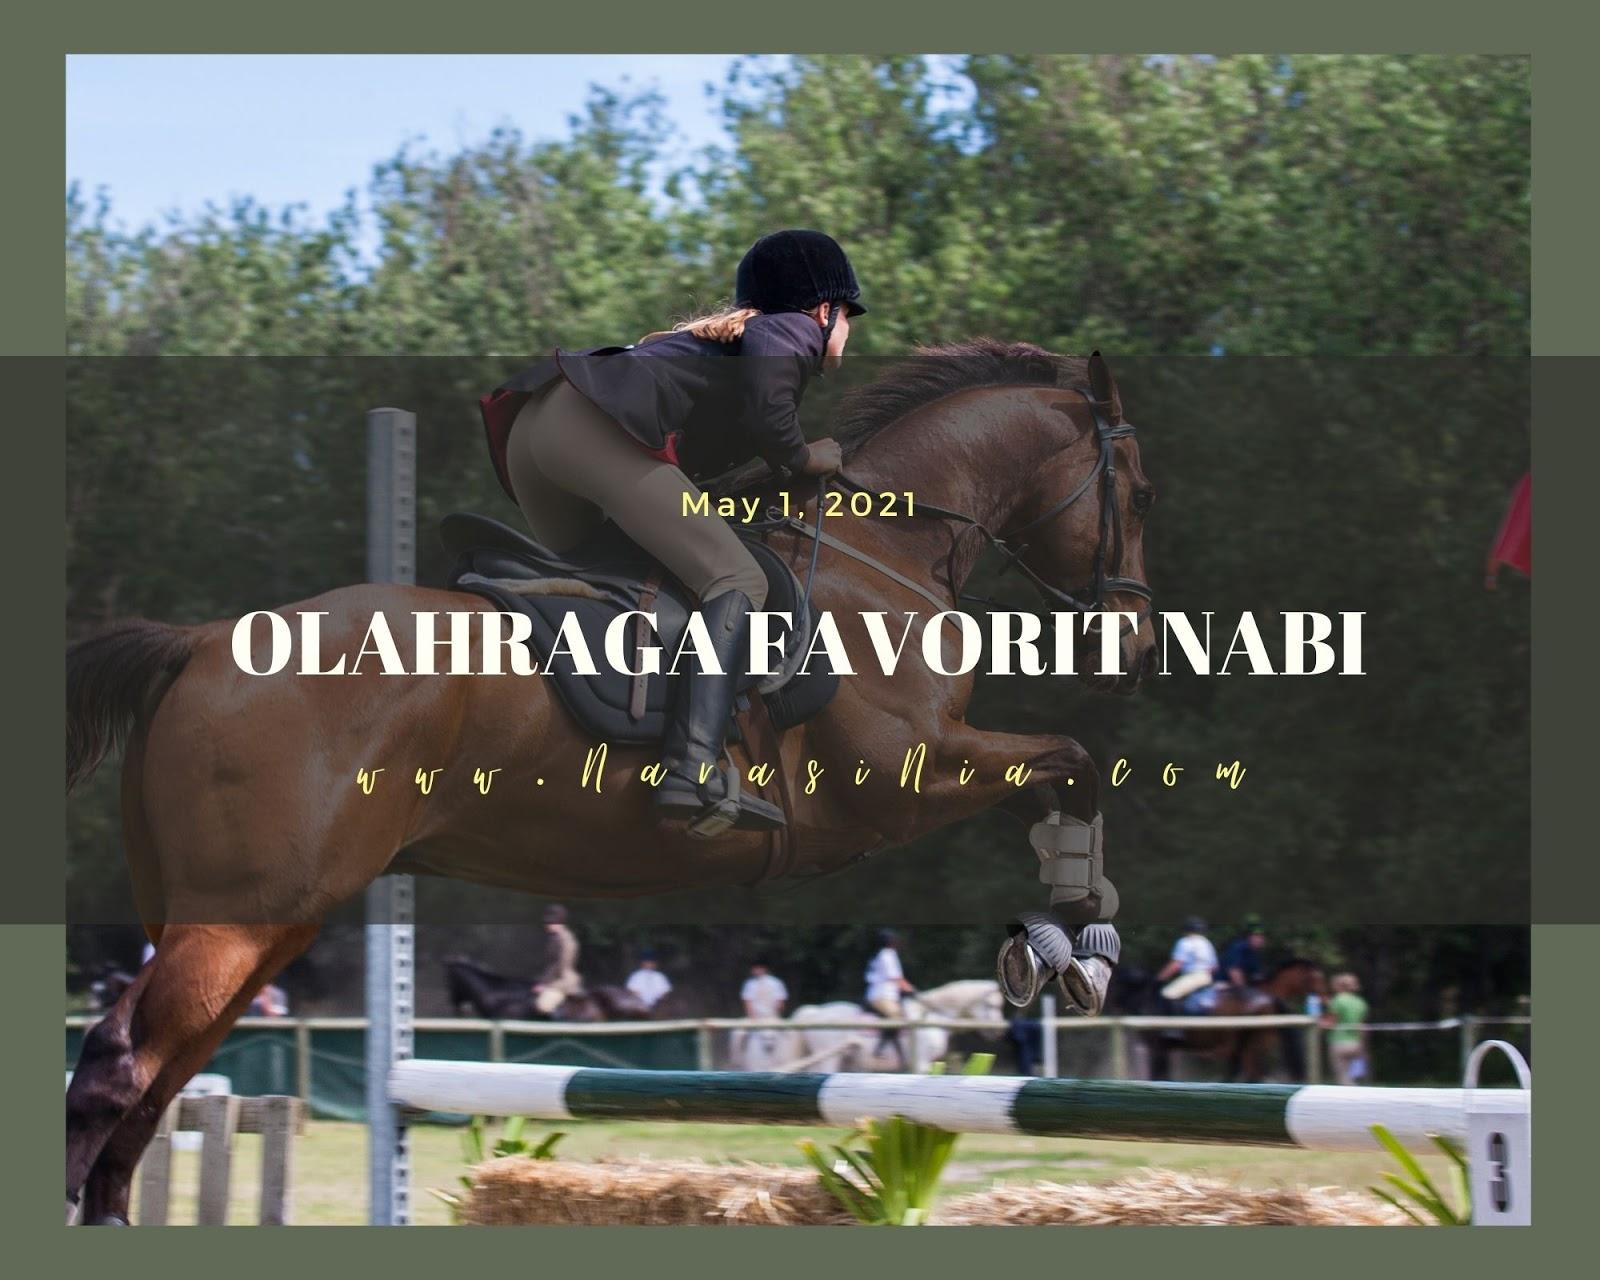 Olahraga Favorit Nabi Muhammad